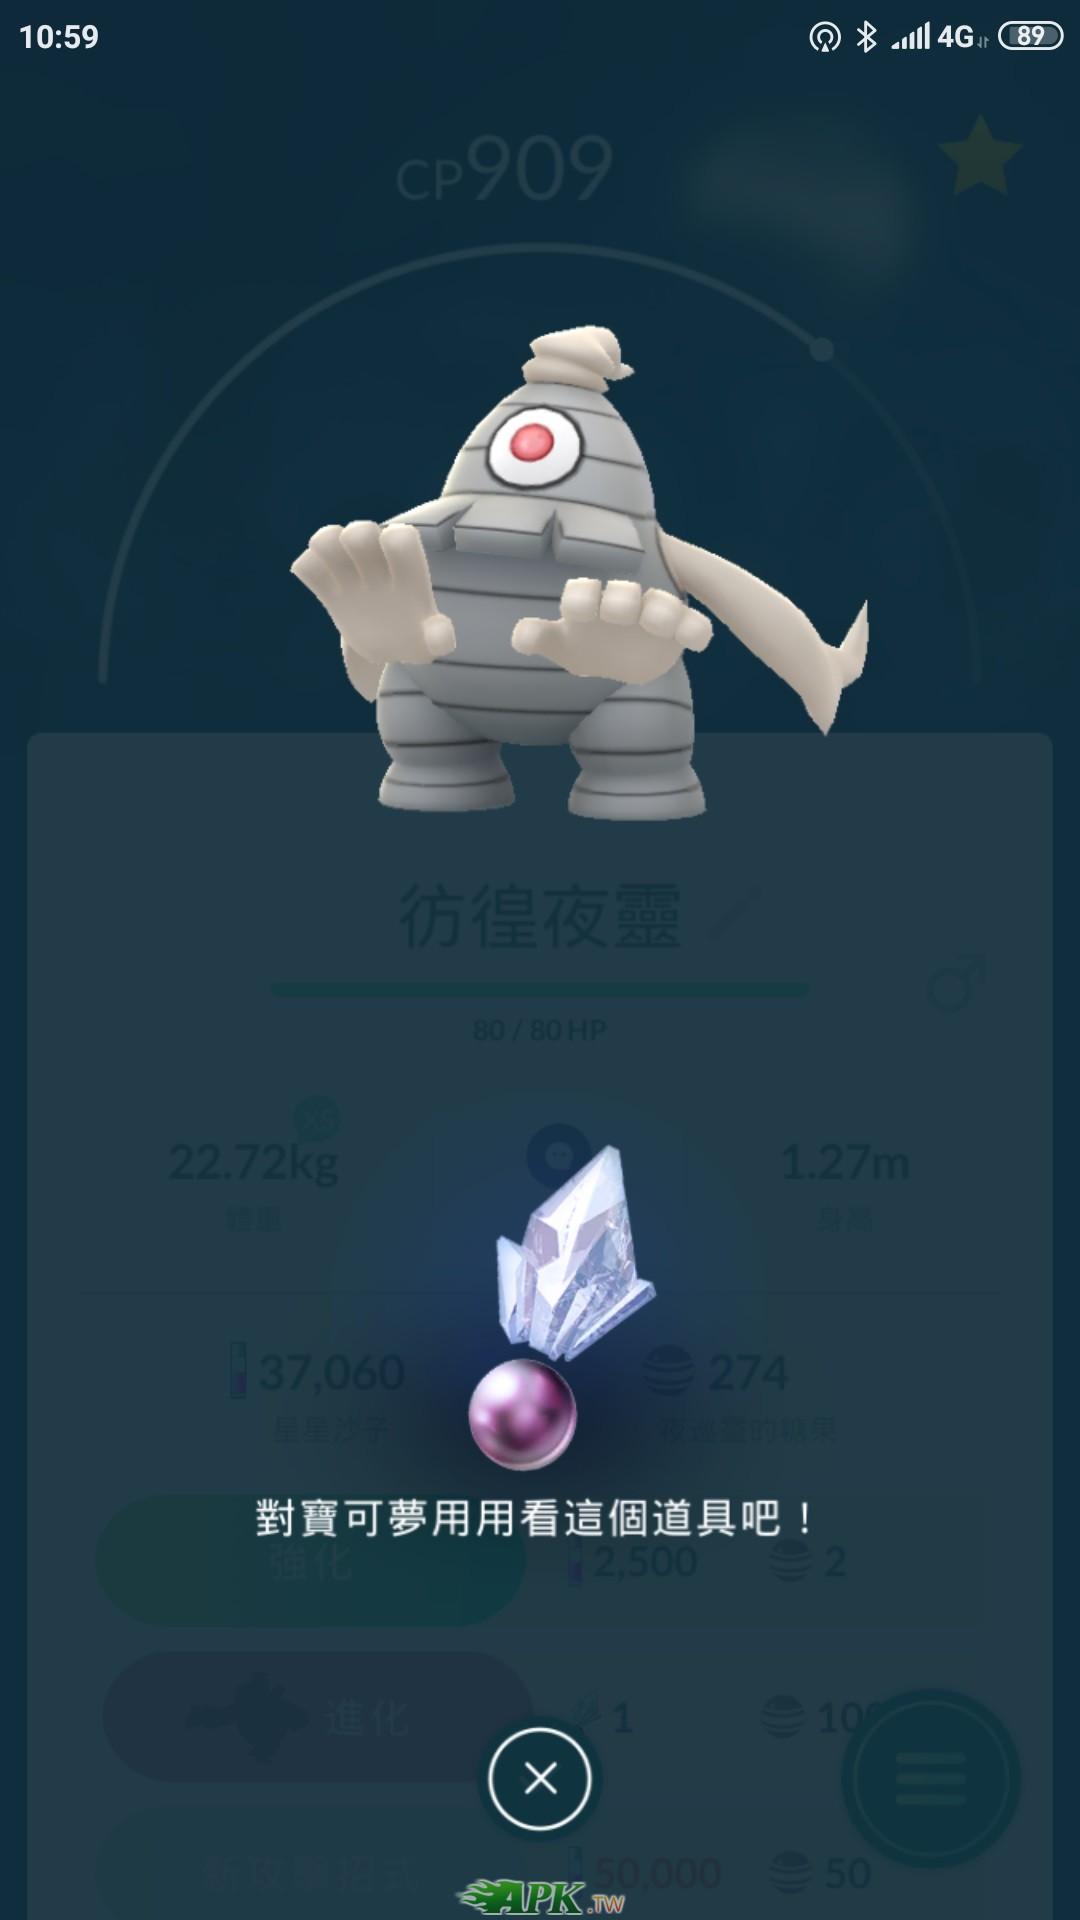 Screenshot_2019-02-18-10-59-28-905_com.nianticlabs.pokemongo.jpg